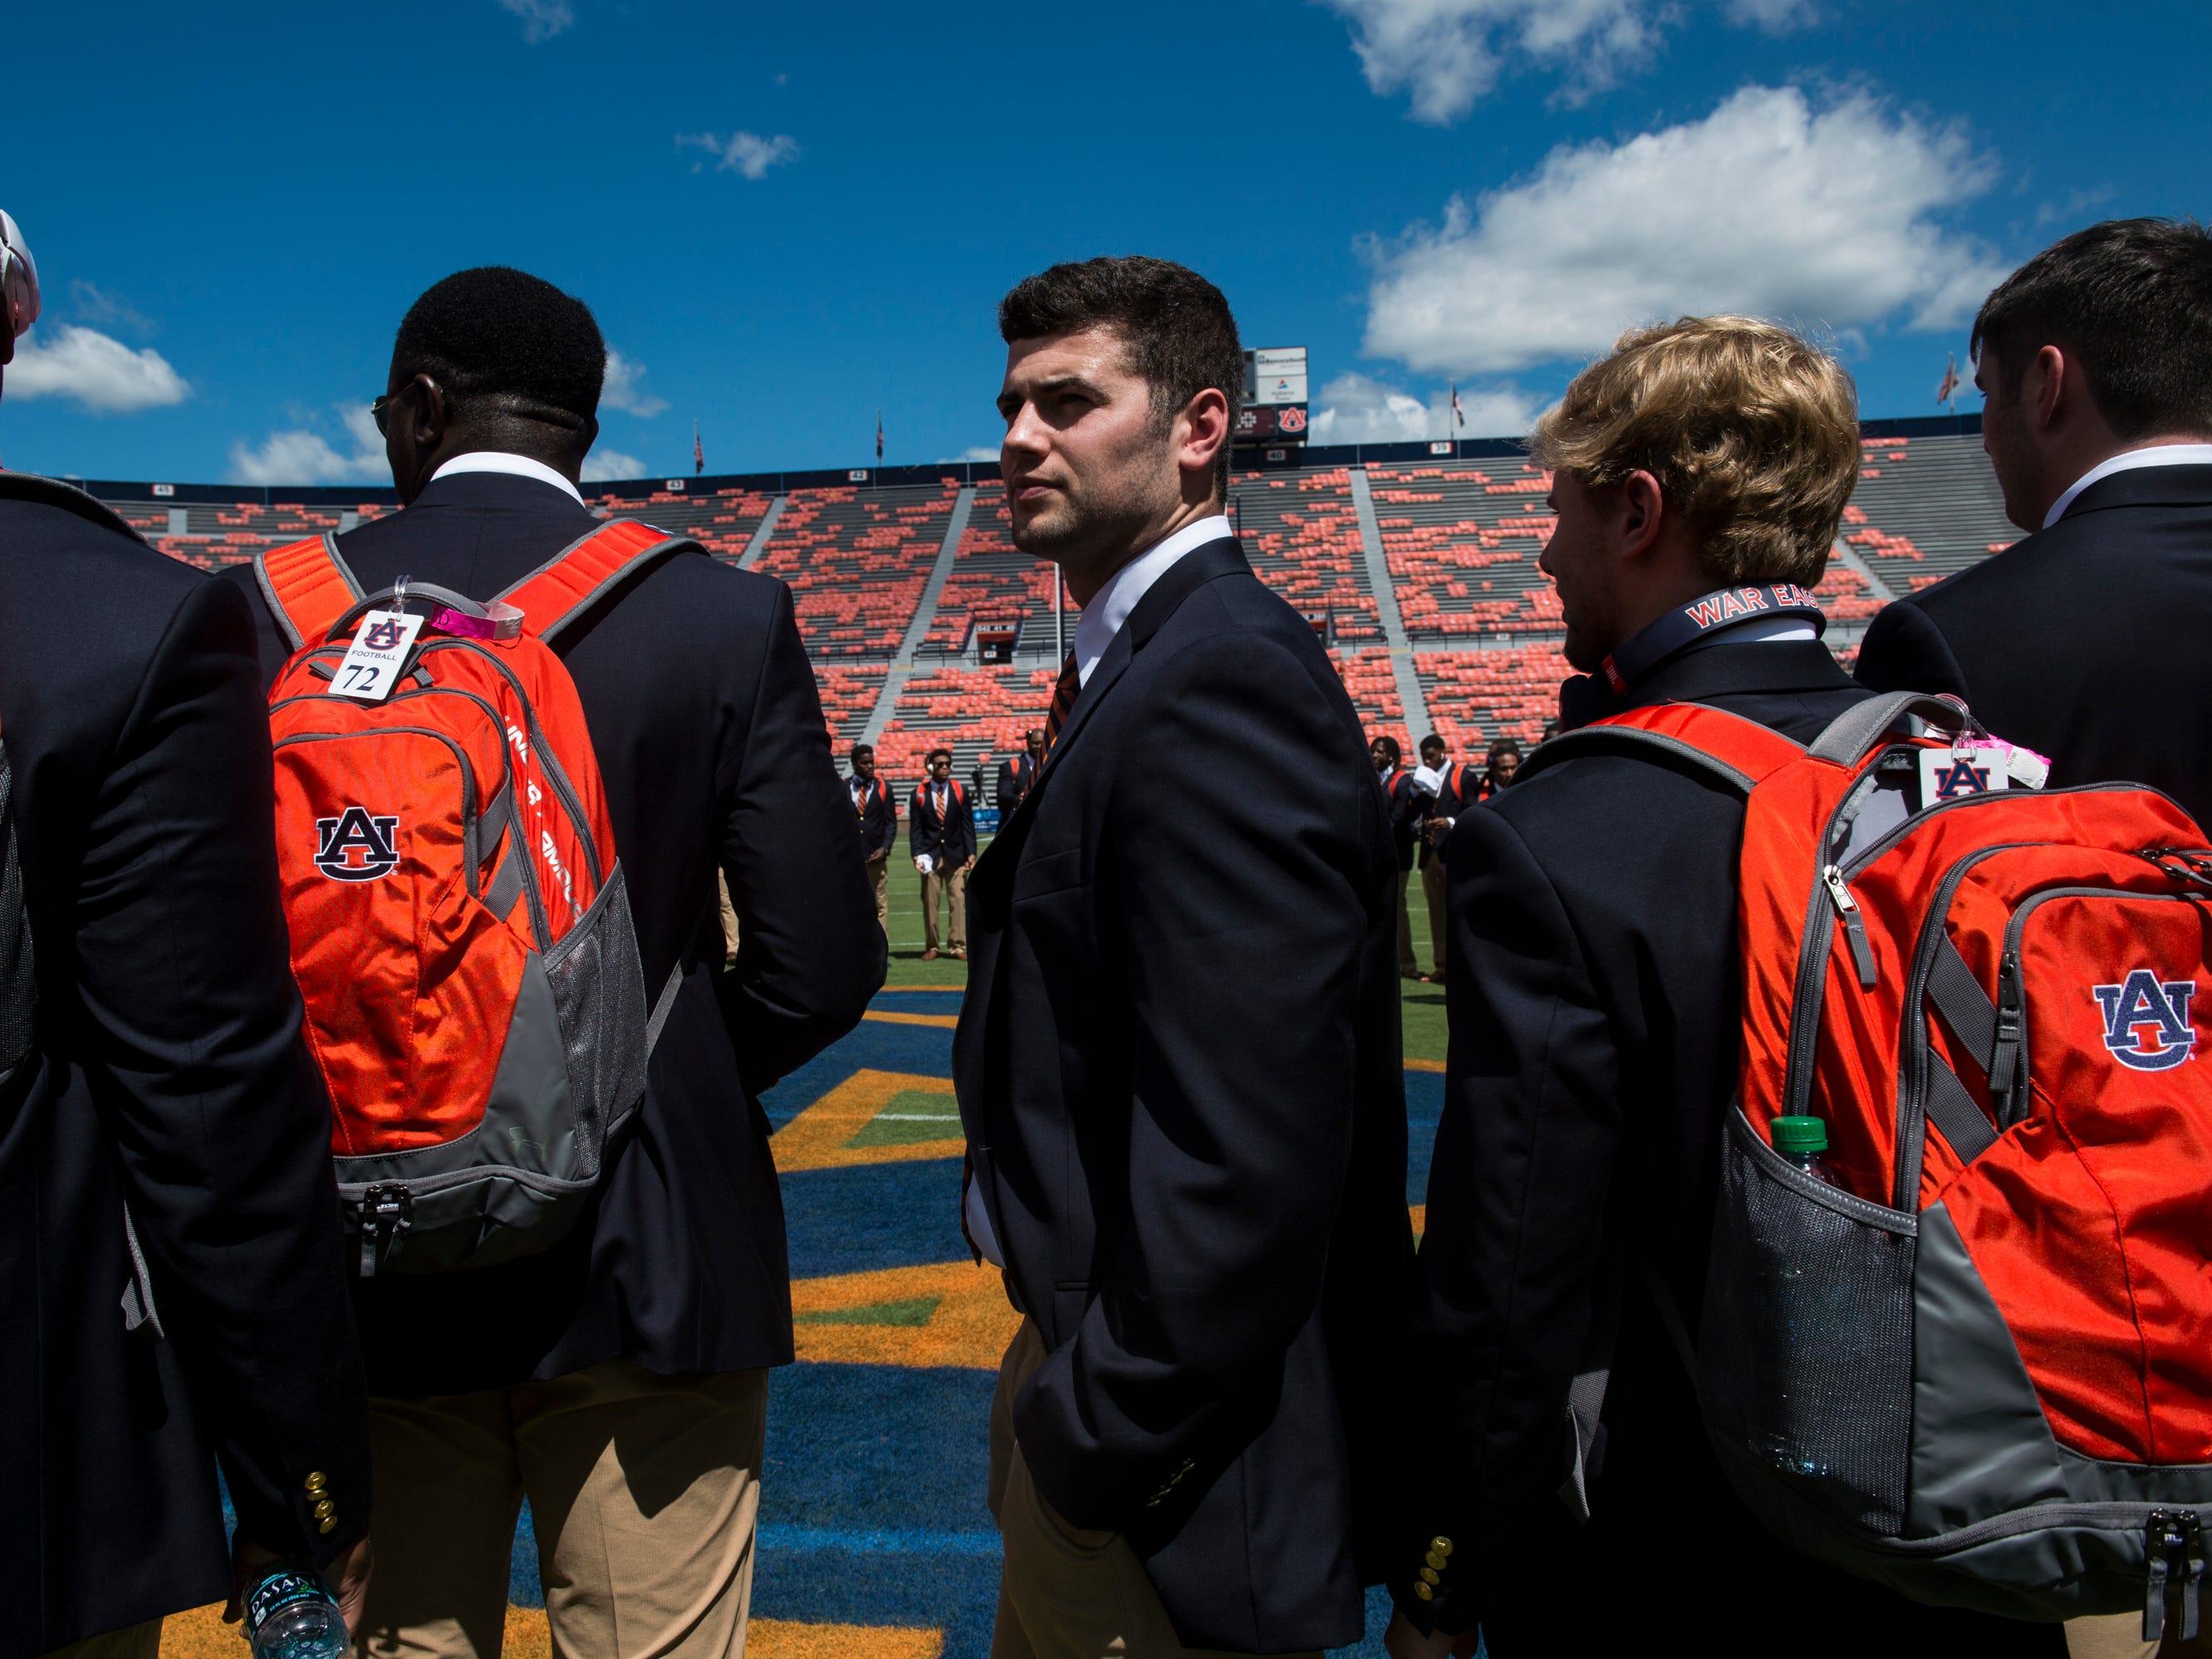 Auburn's Jarrett Stidham (8) huddles with his team after the Tiger Walk at Jordan-Hare Stadium in Auburn, Ala., on Saturday, Sept. 15, 2018.